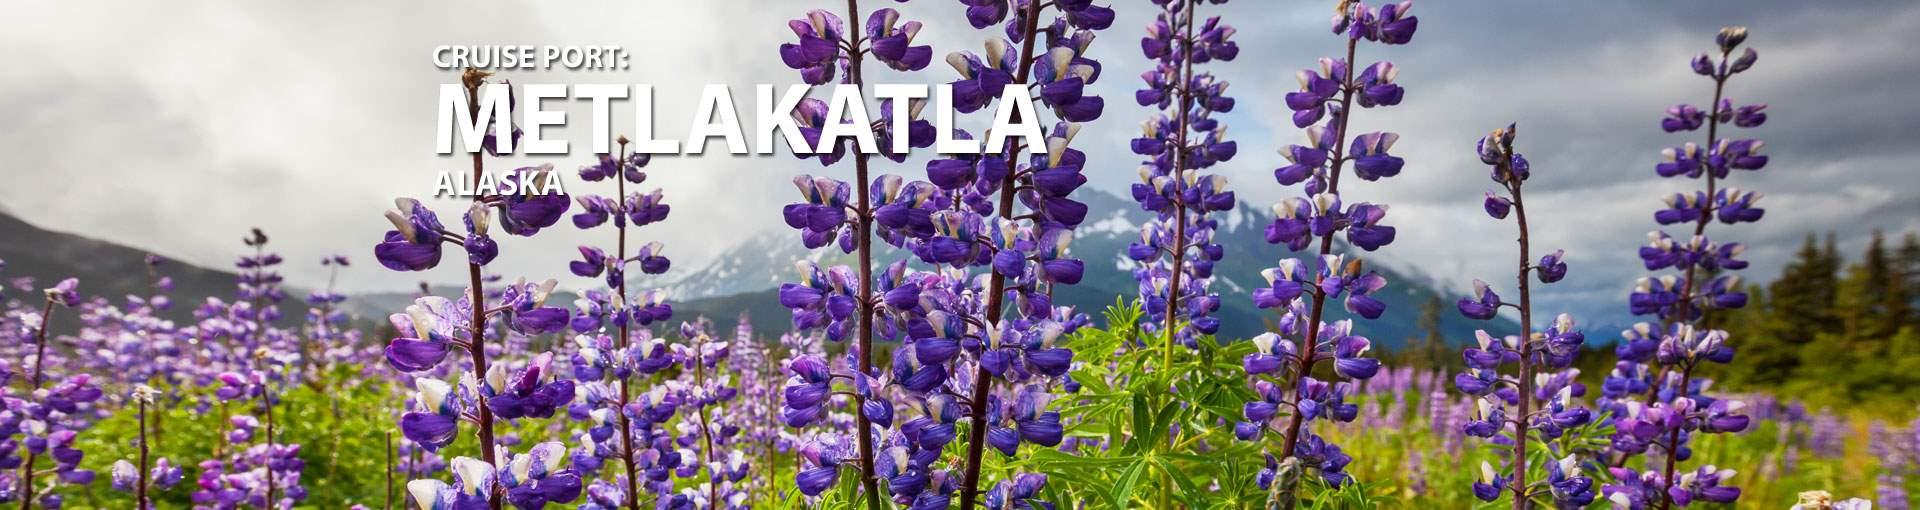 Cruises to Metlakatla, Alaska